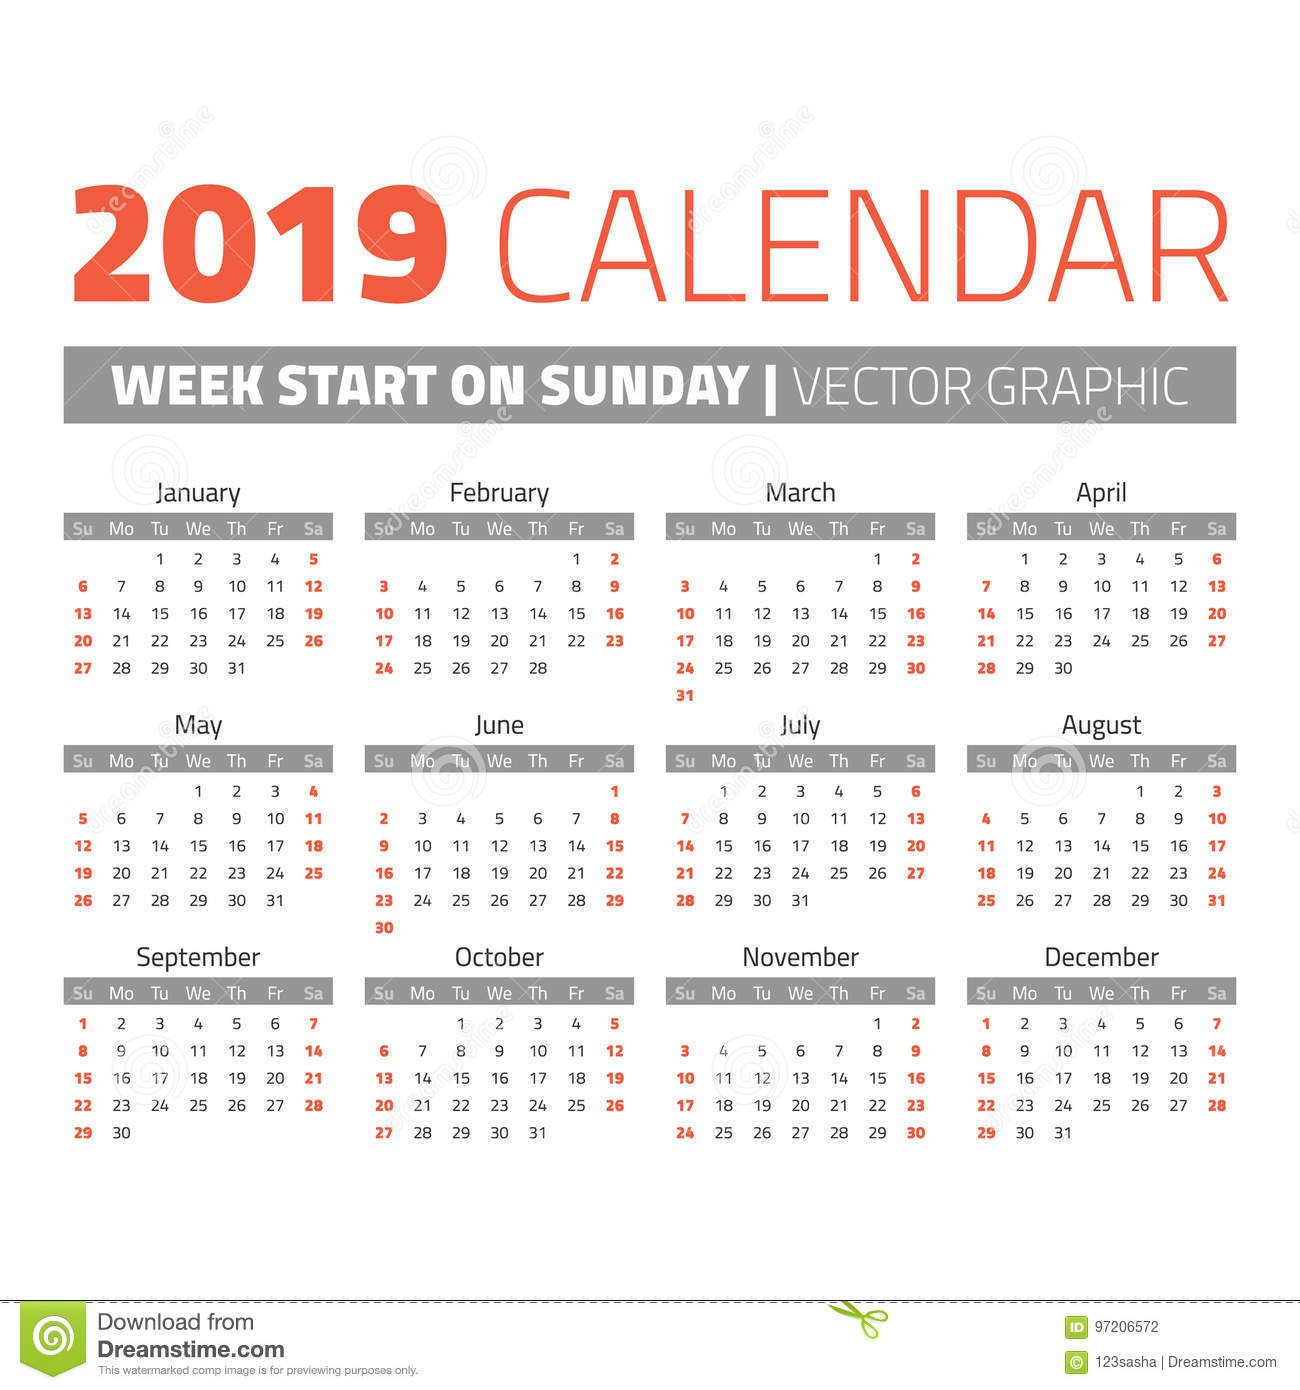 Simple 2019 Year Calendar Stock Vector. Illustration Of Date - 97206572 Calendar Week 10 2019